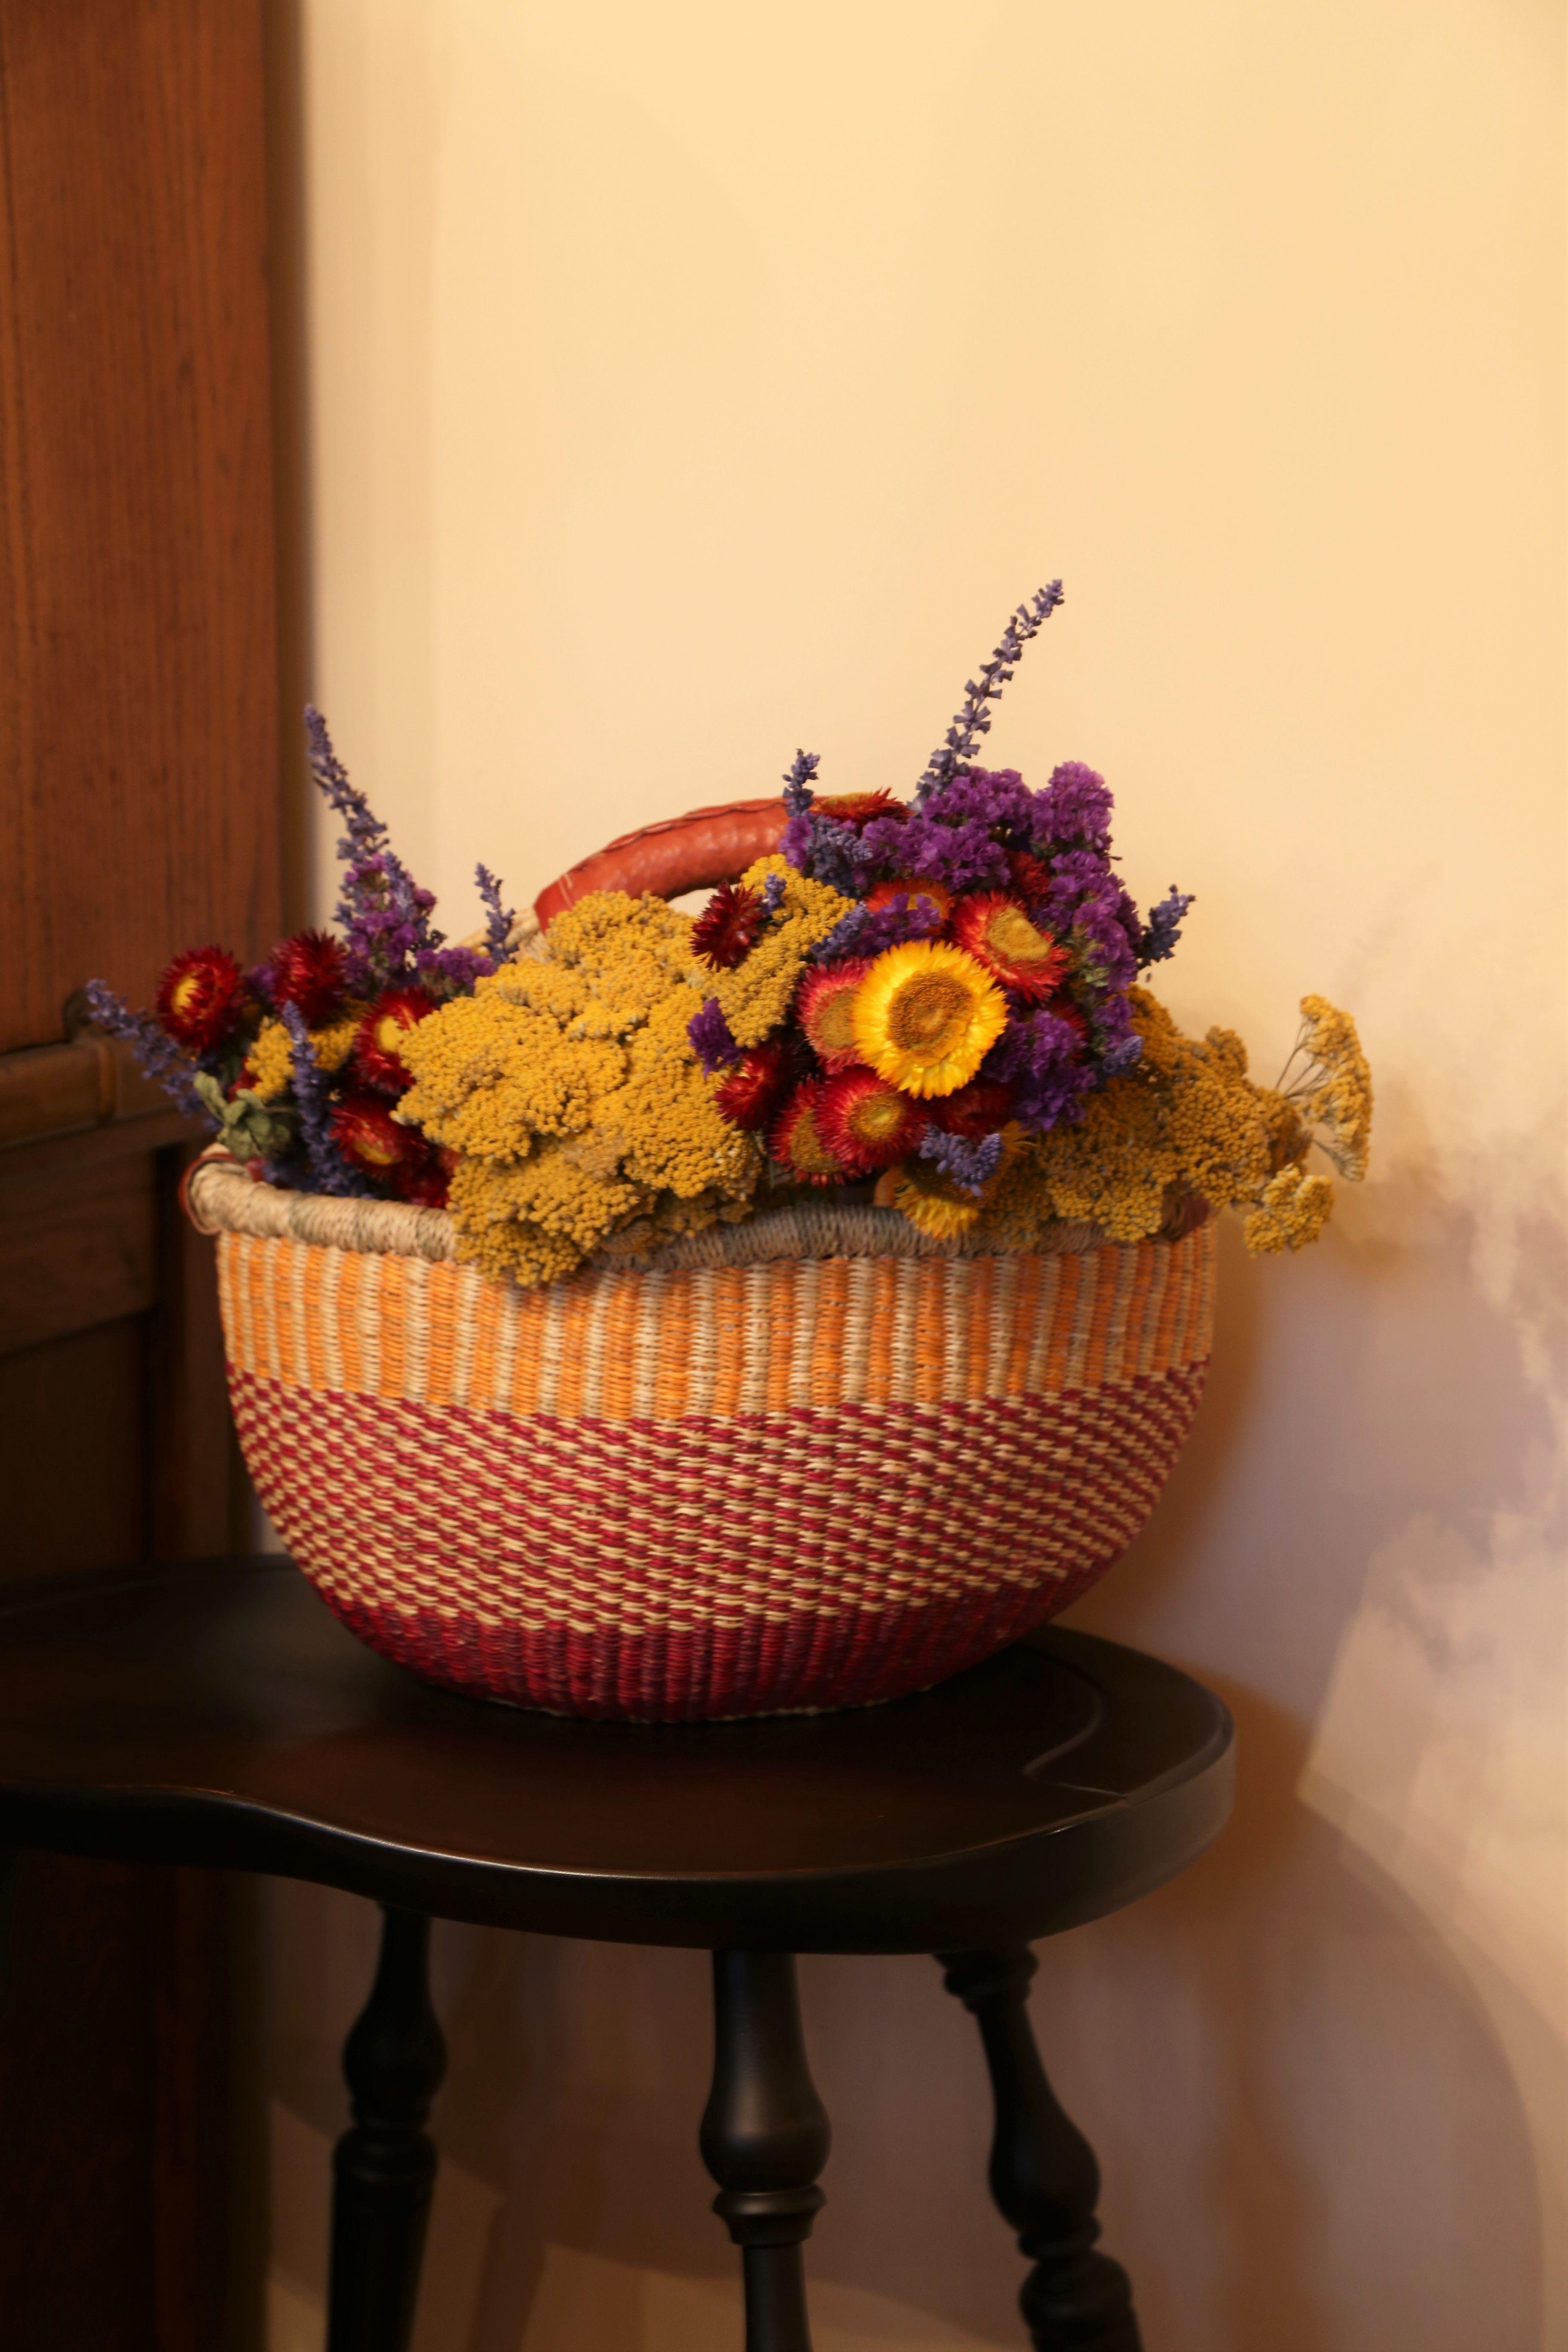 Fair Trade - Handmade - Bolga Basket from Ghana